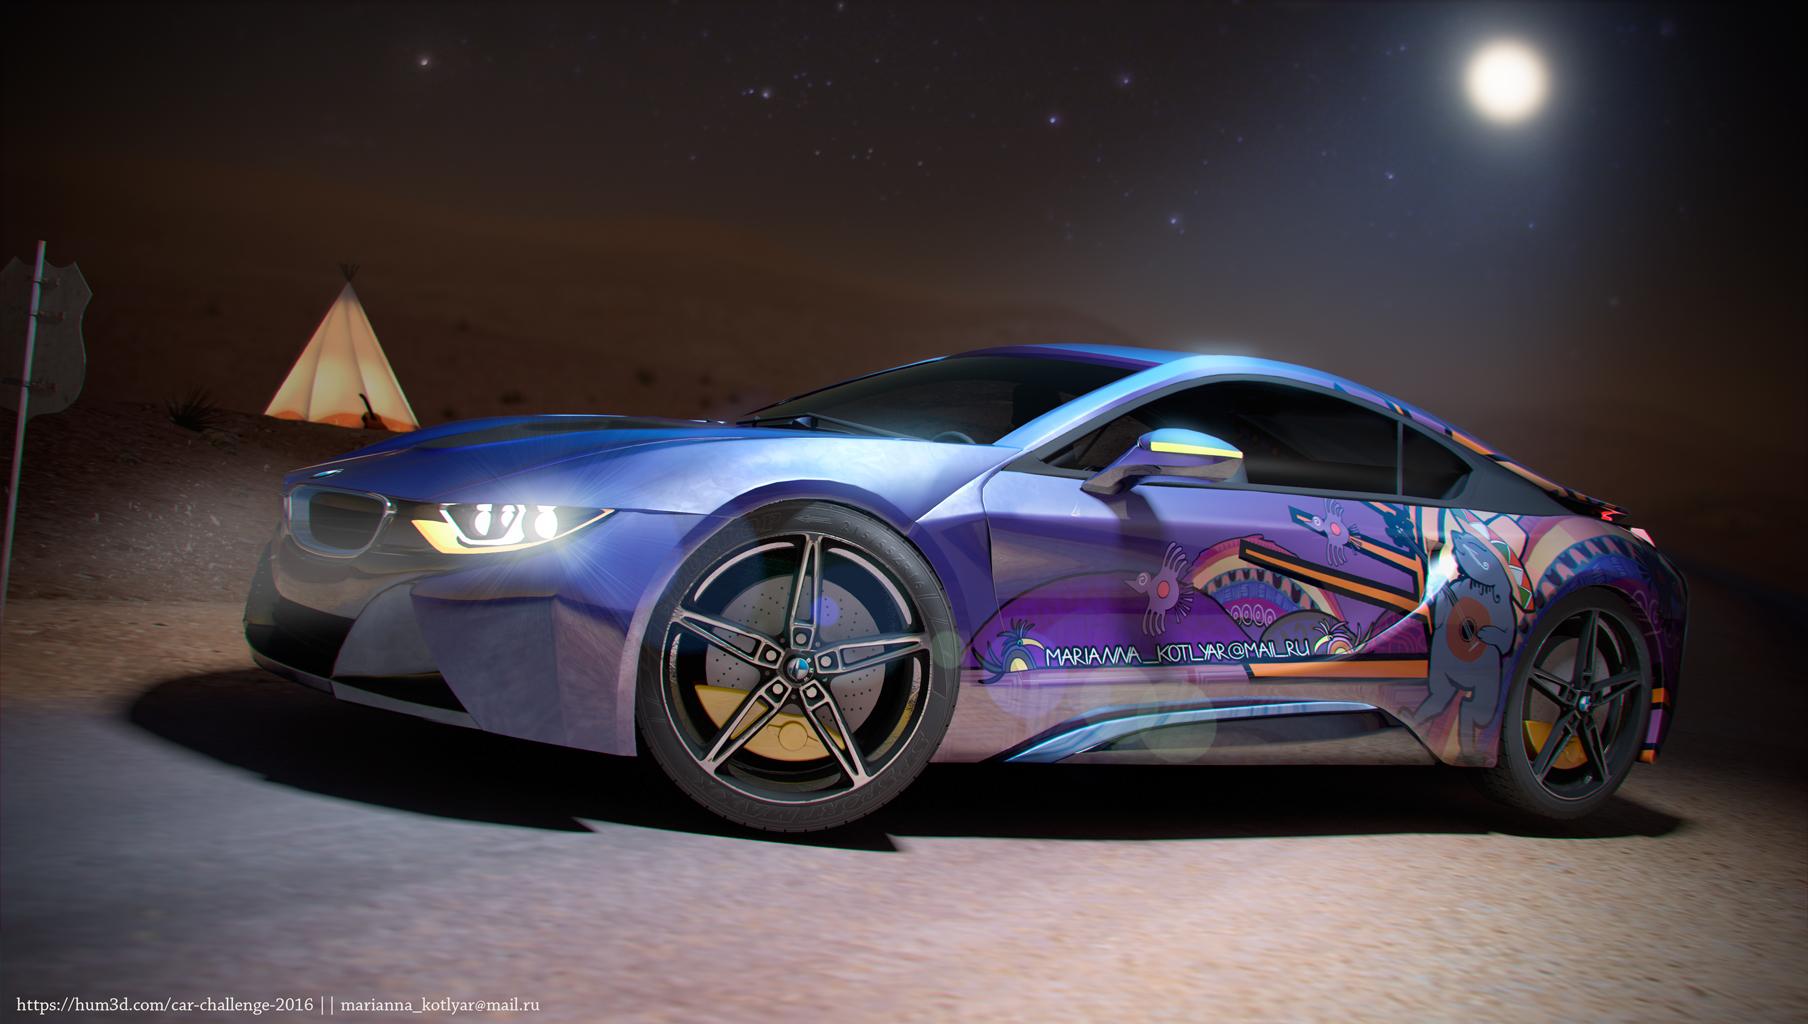 Moonlight desert BMW i8 3d art